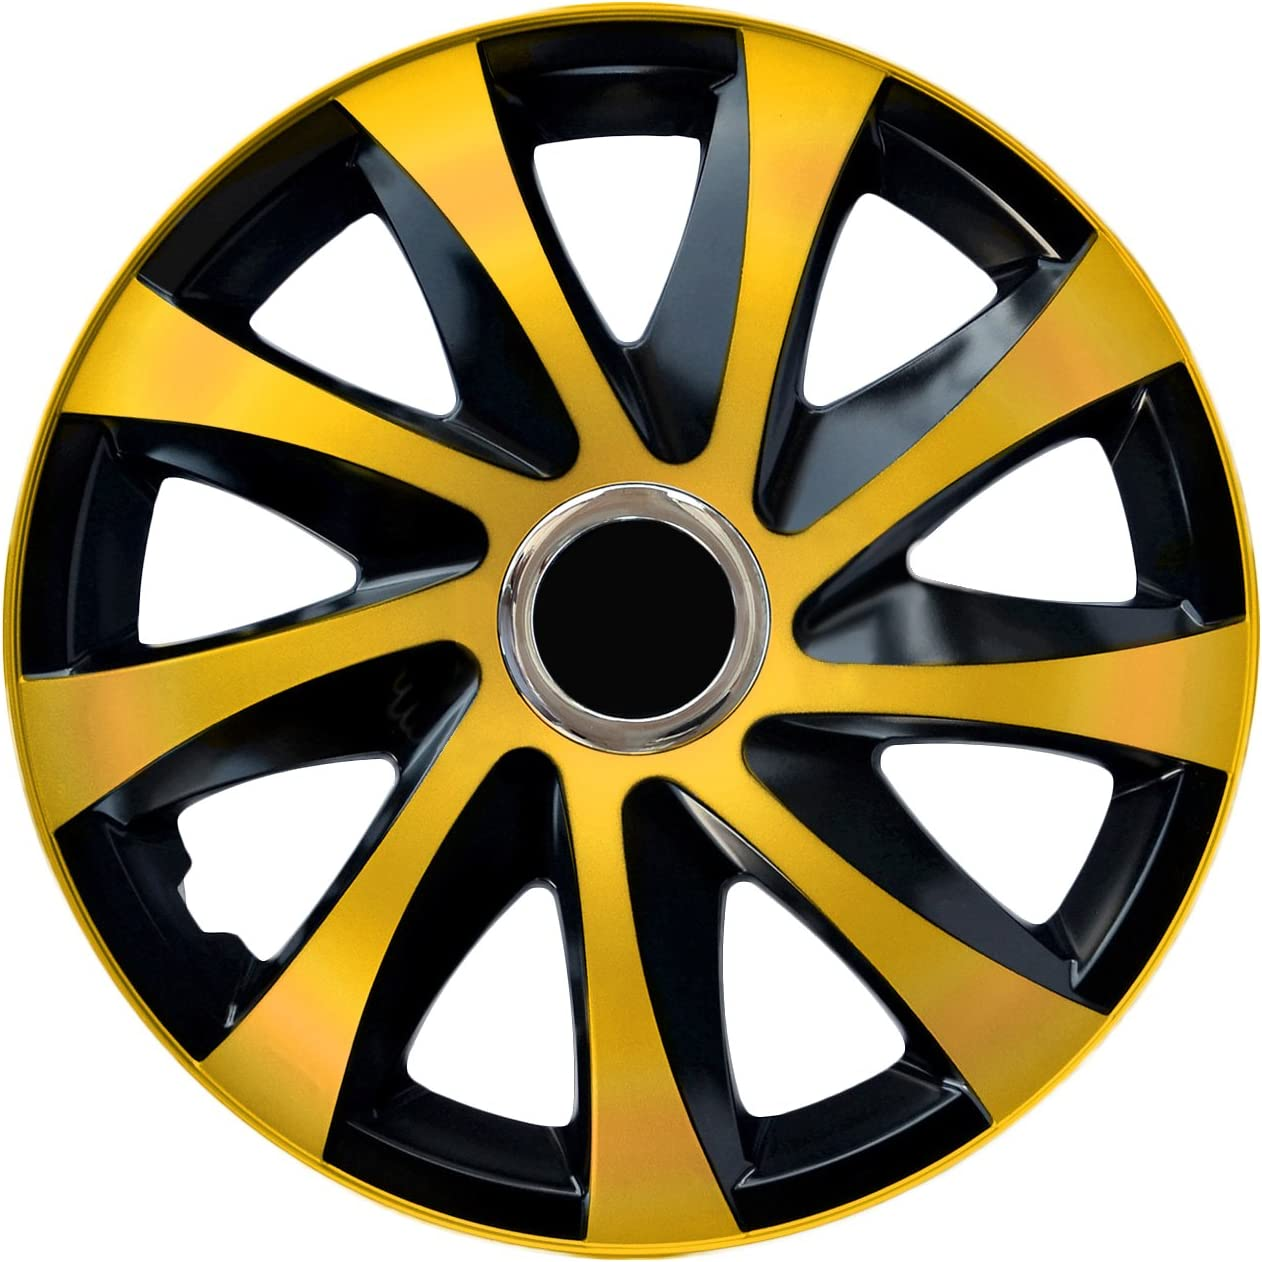 NRM Drift EXTRA 4 x Universal Radzierblenden Radkappen Satz 4er Set Auto KFZ Matt Schwarz, 16